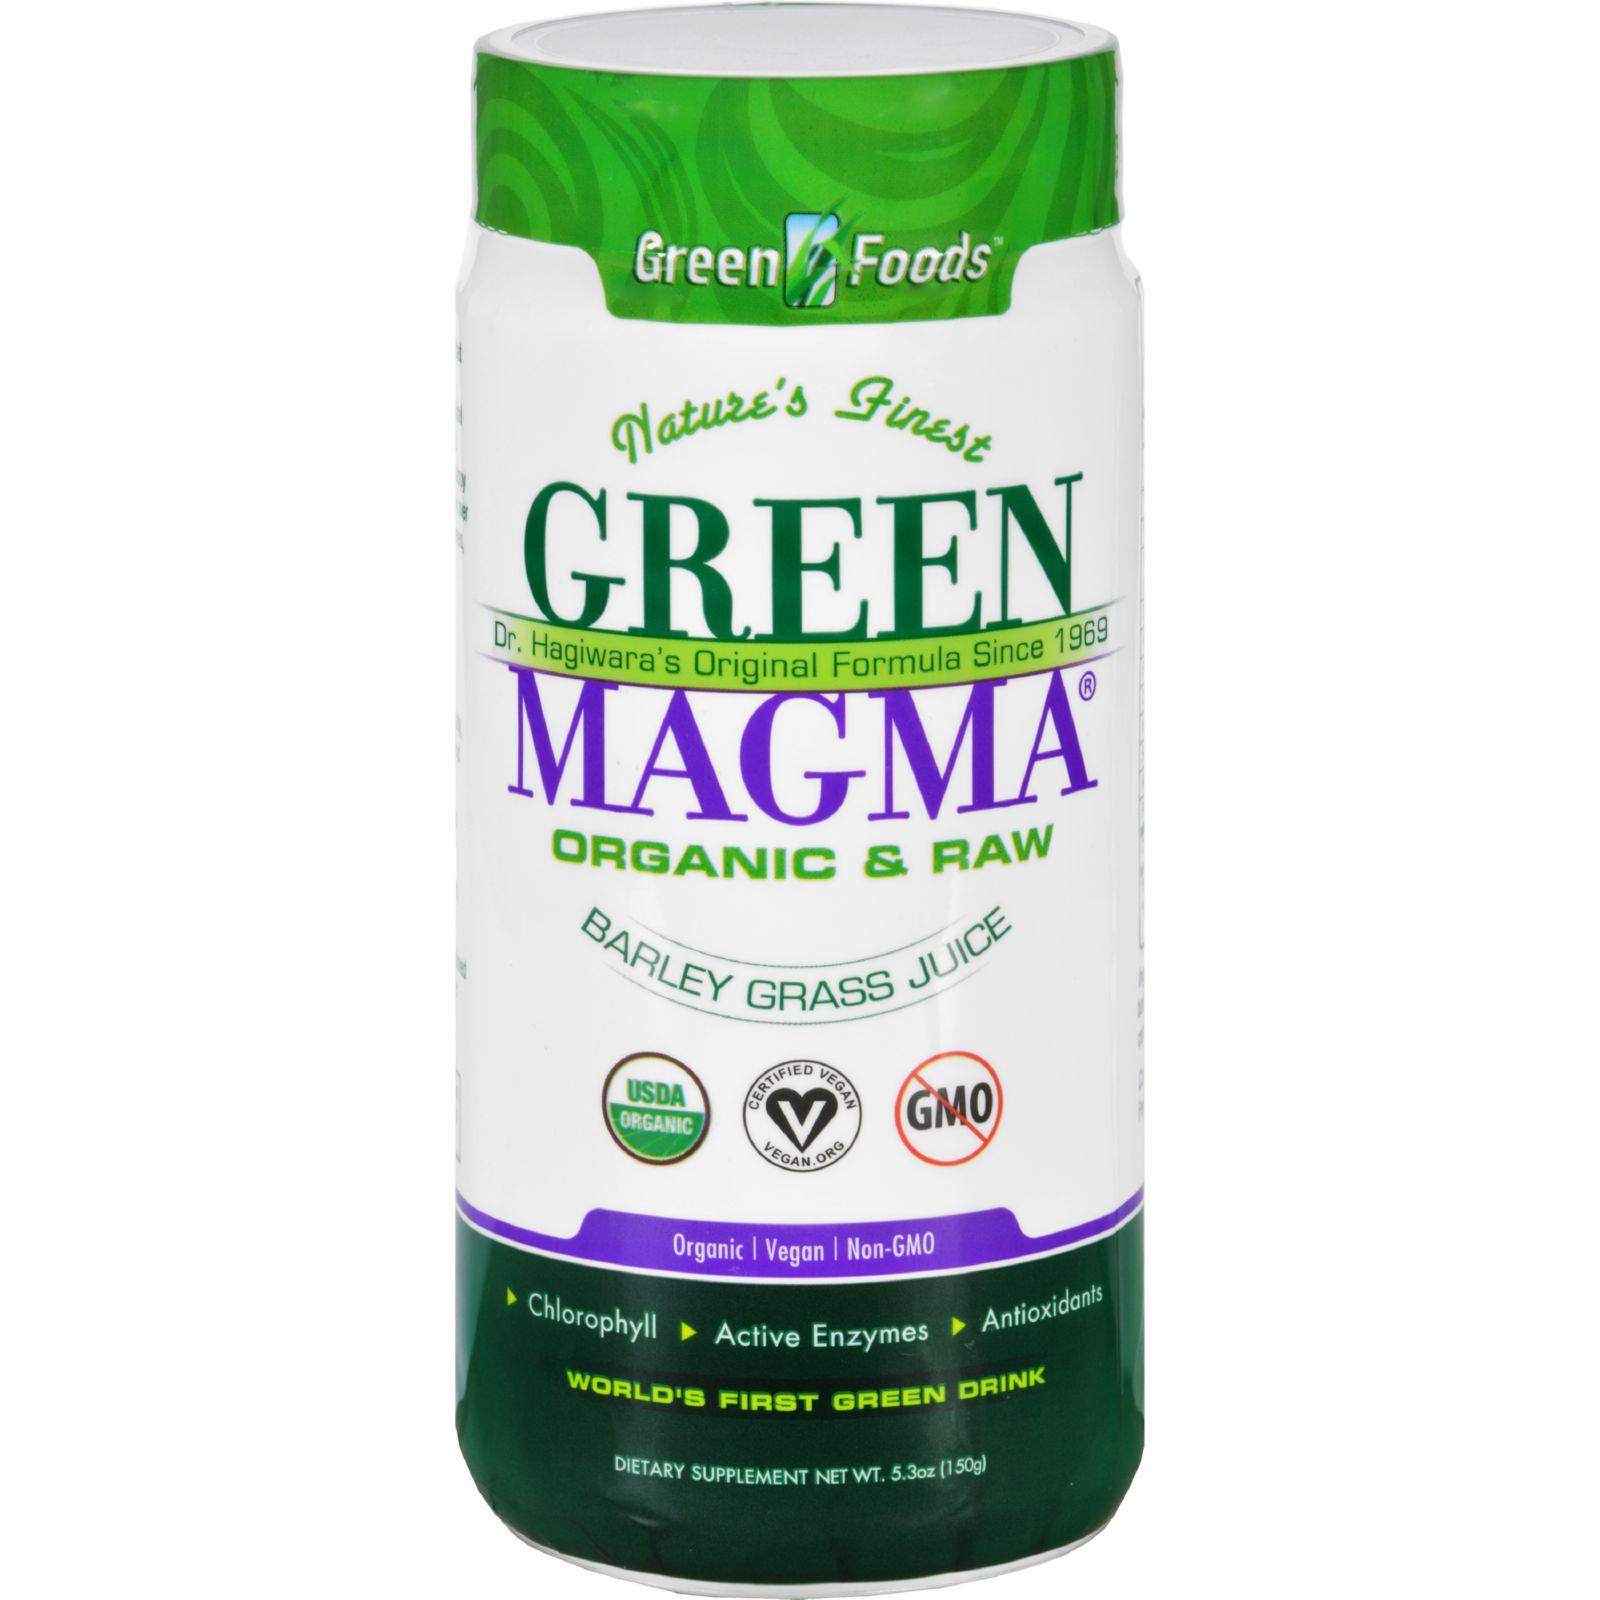 Green Foods Dr Hagiwara Green Magma Barley Grass Juice Po...